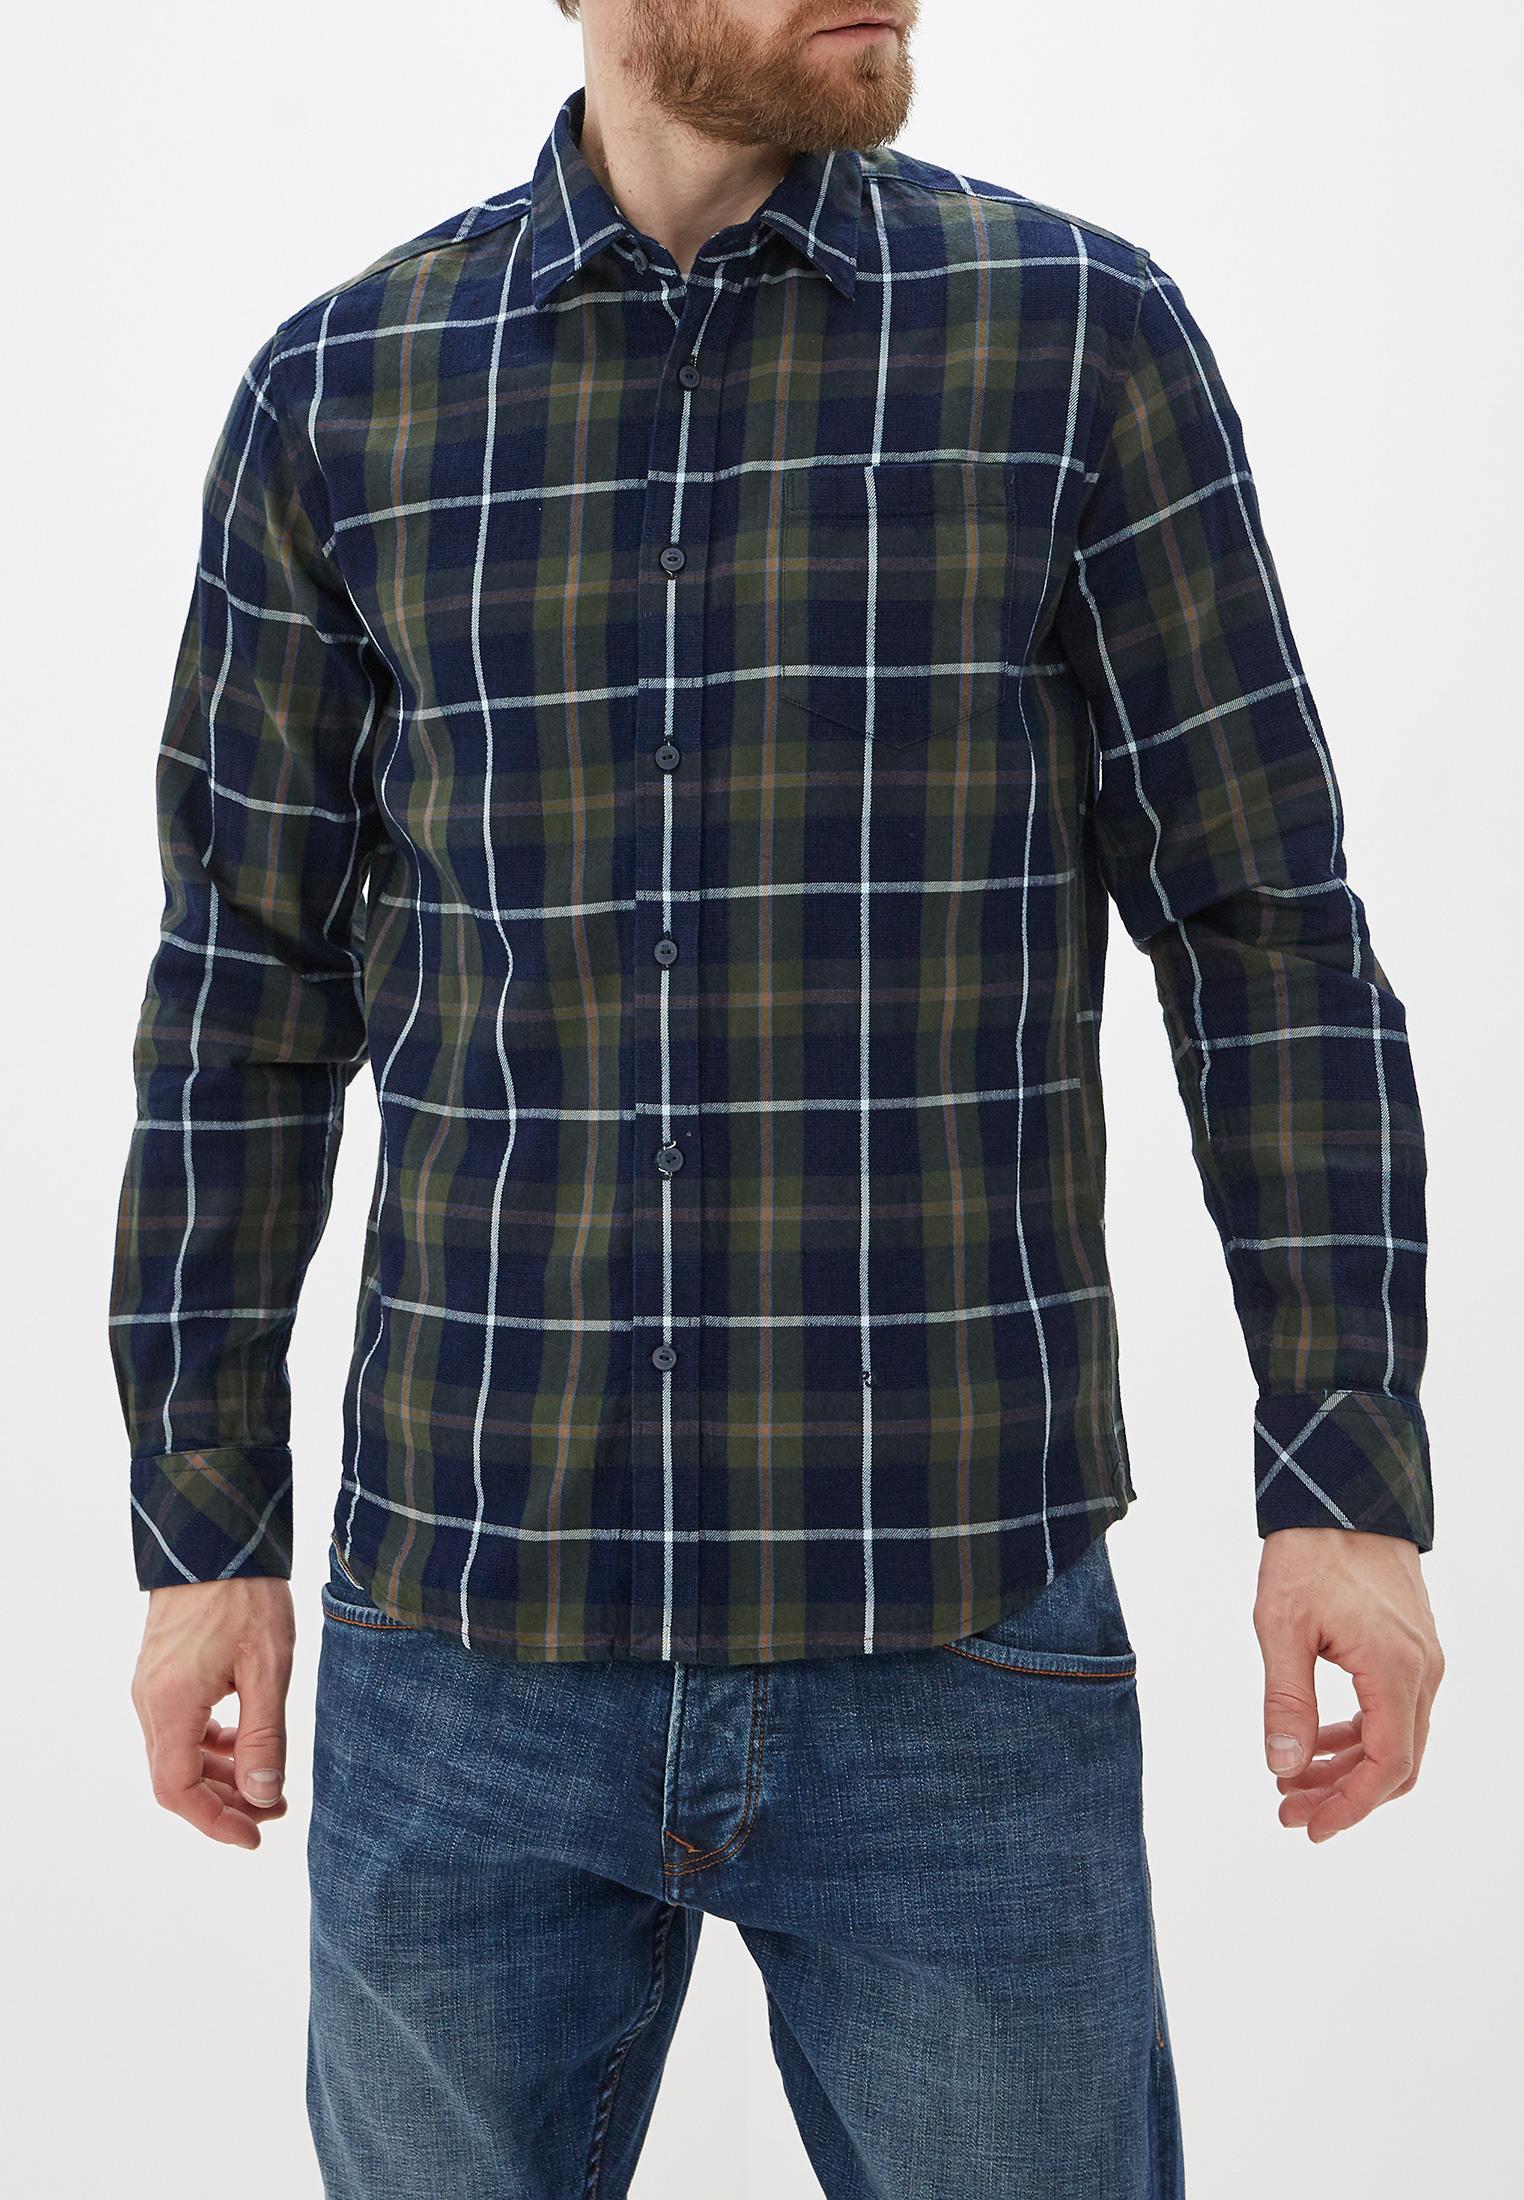 Рубашка с длинным рукавом Pepe Jeans (Пепе Джинс) PM306076